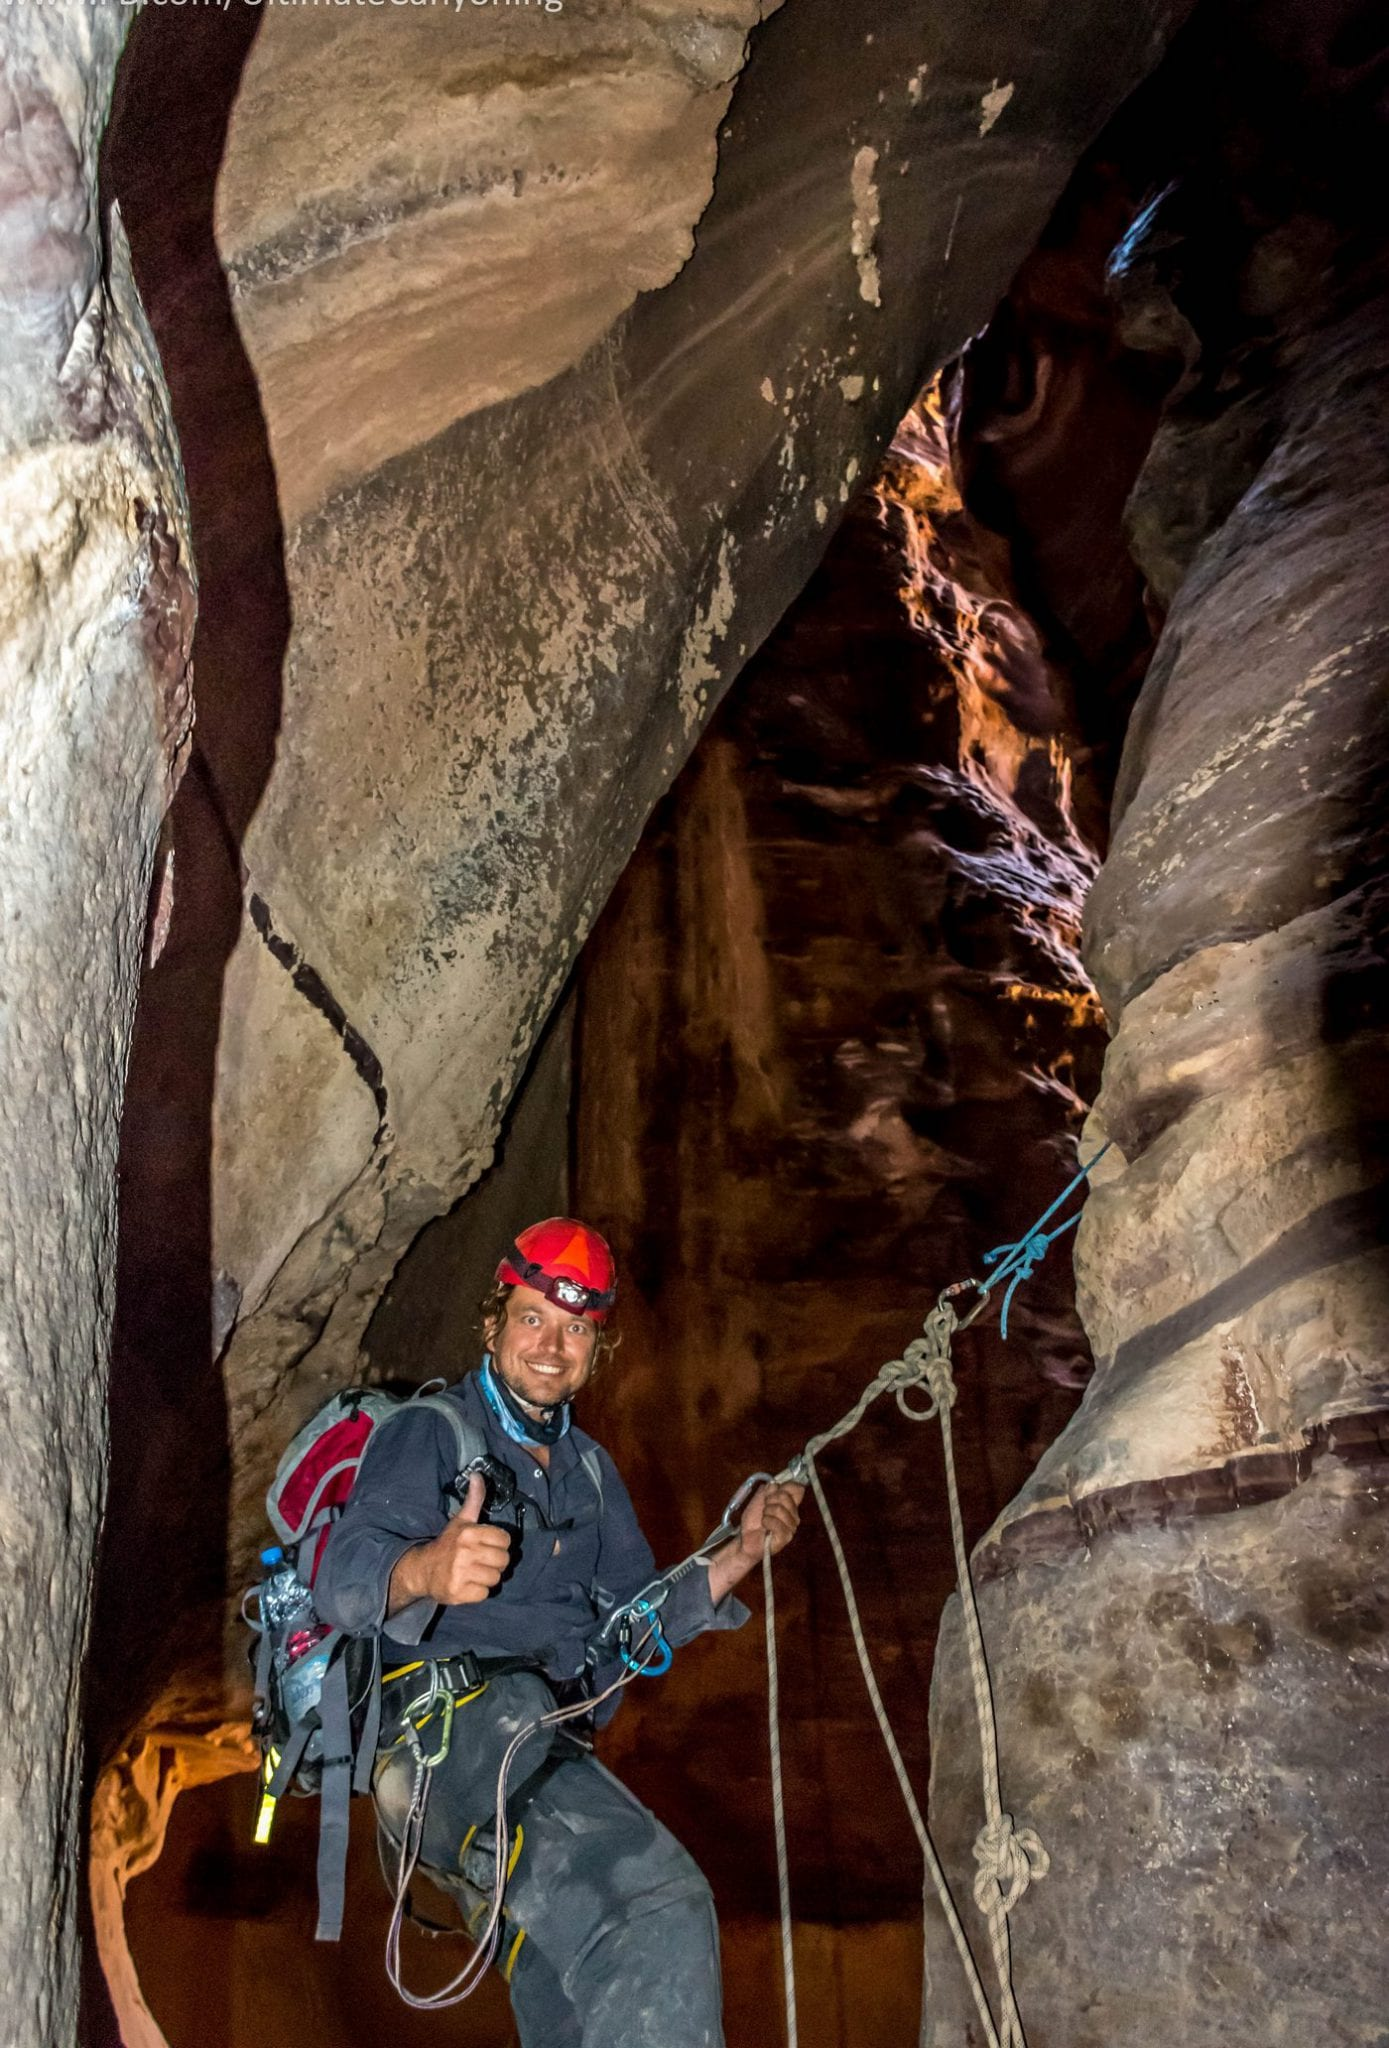 סנפלינג בקניון צר ועמוק - ירדן עם ערוצים טבע